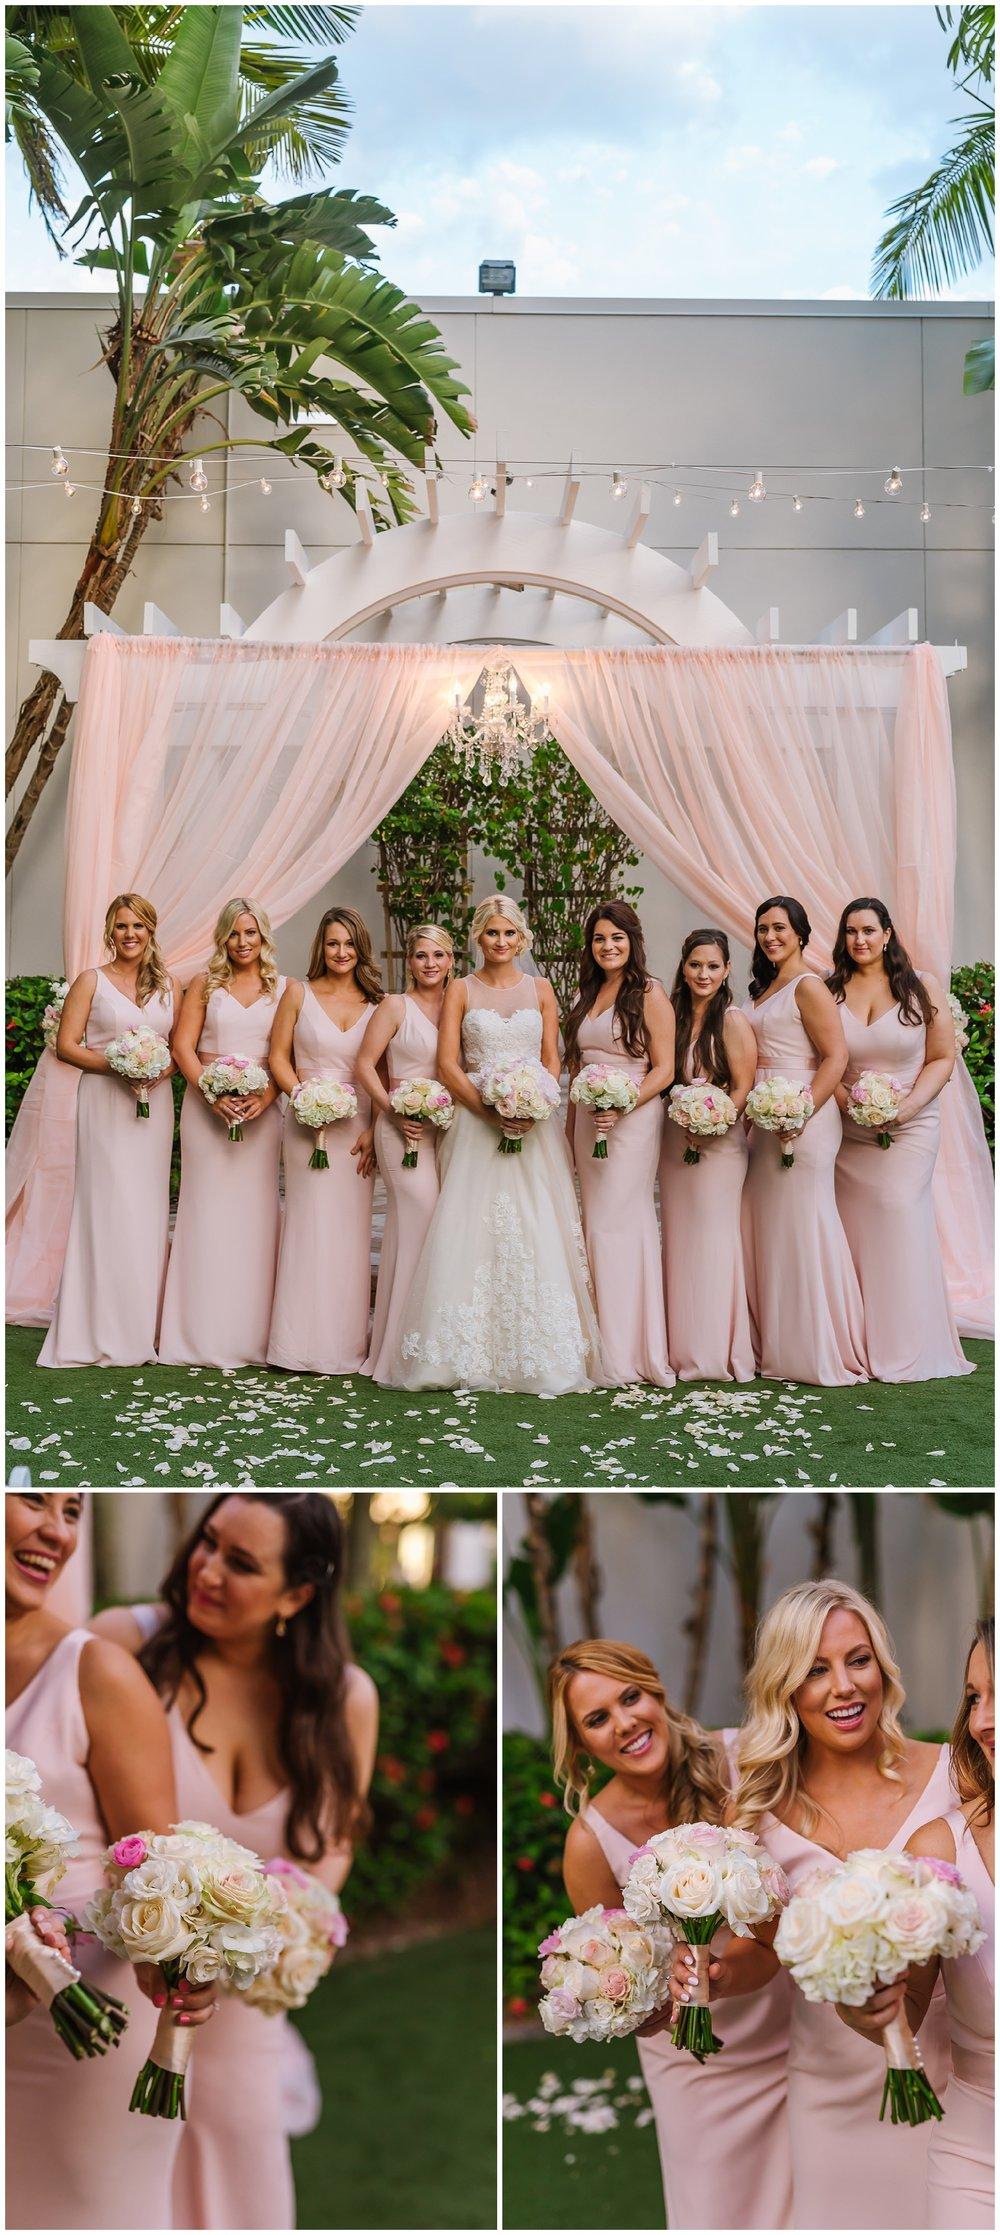 Sarasota-wedding-photographer-hyatt-regency-blush_0046.jpg